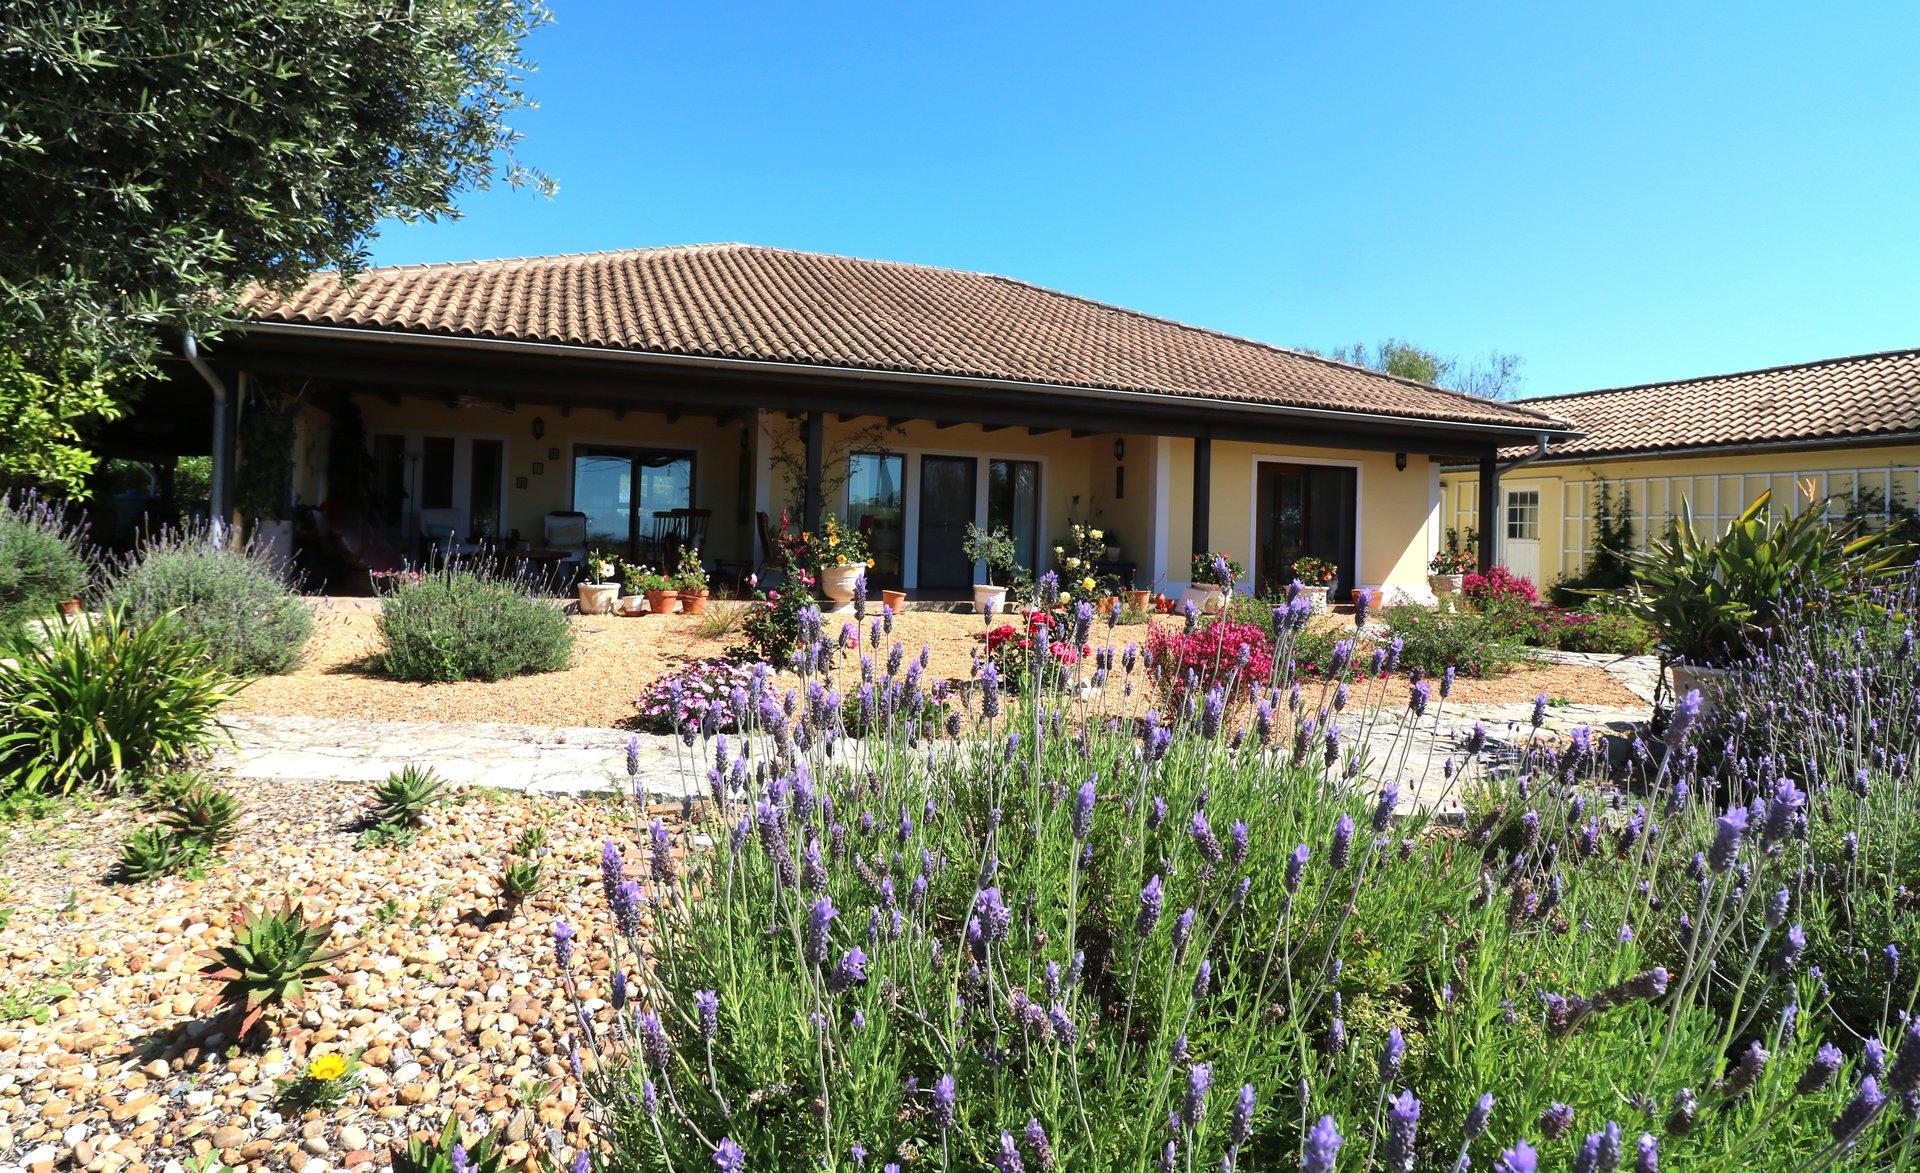 4 Bedroom Villa Santa Barbara de Nexe, Central Algarve Ref: JV10446